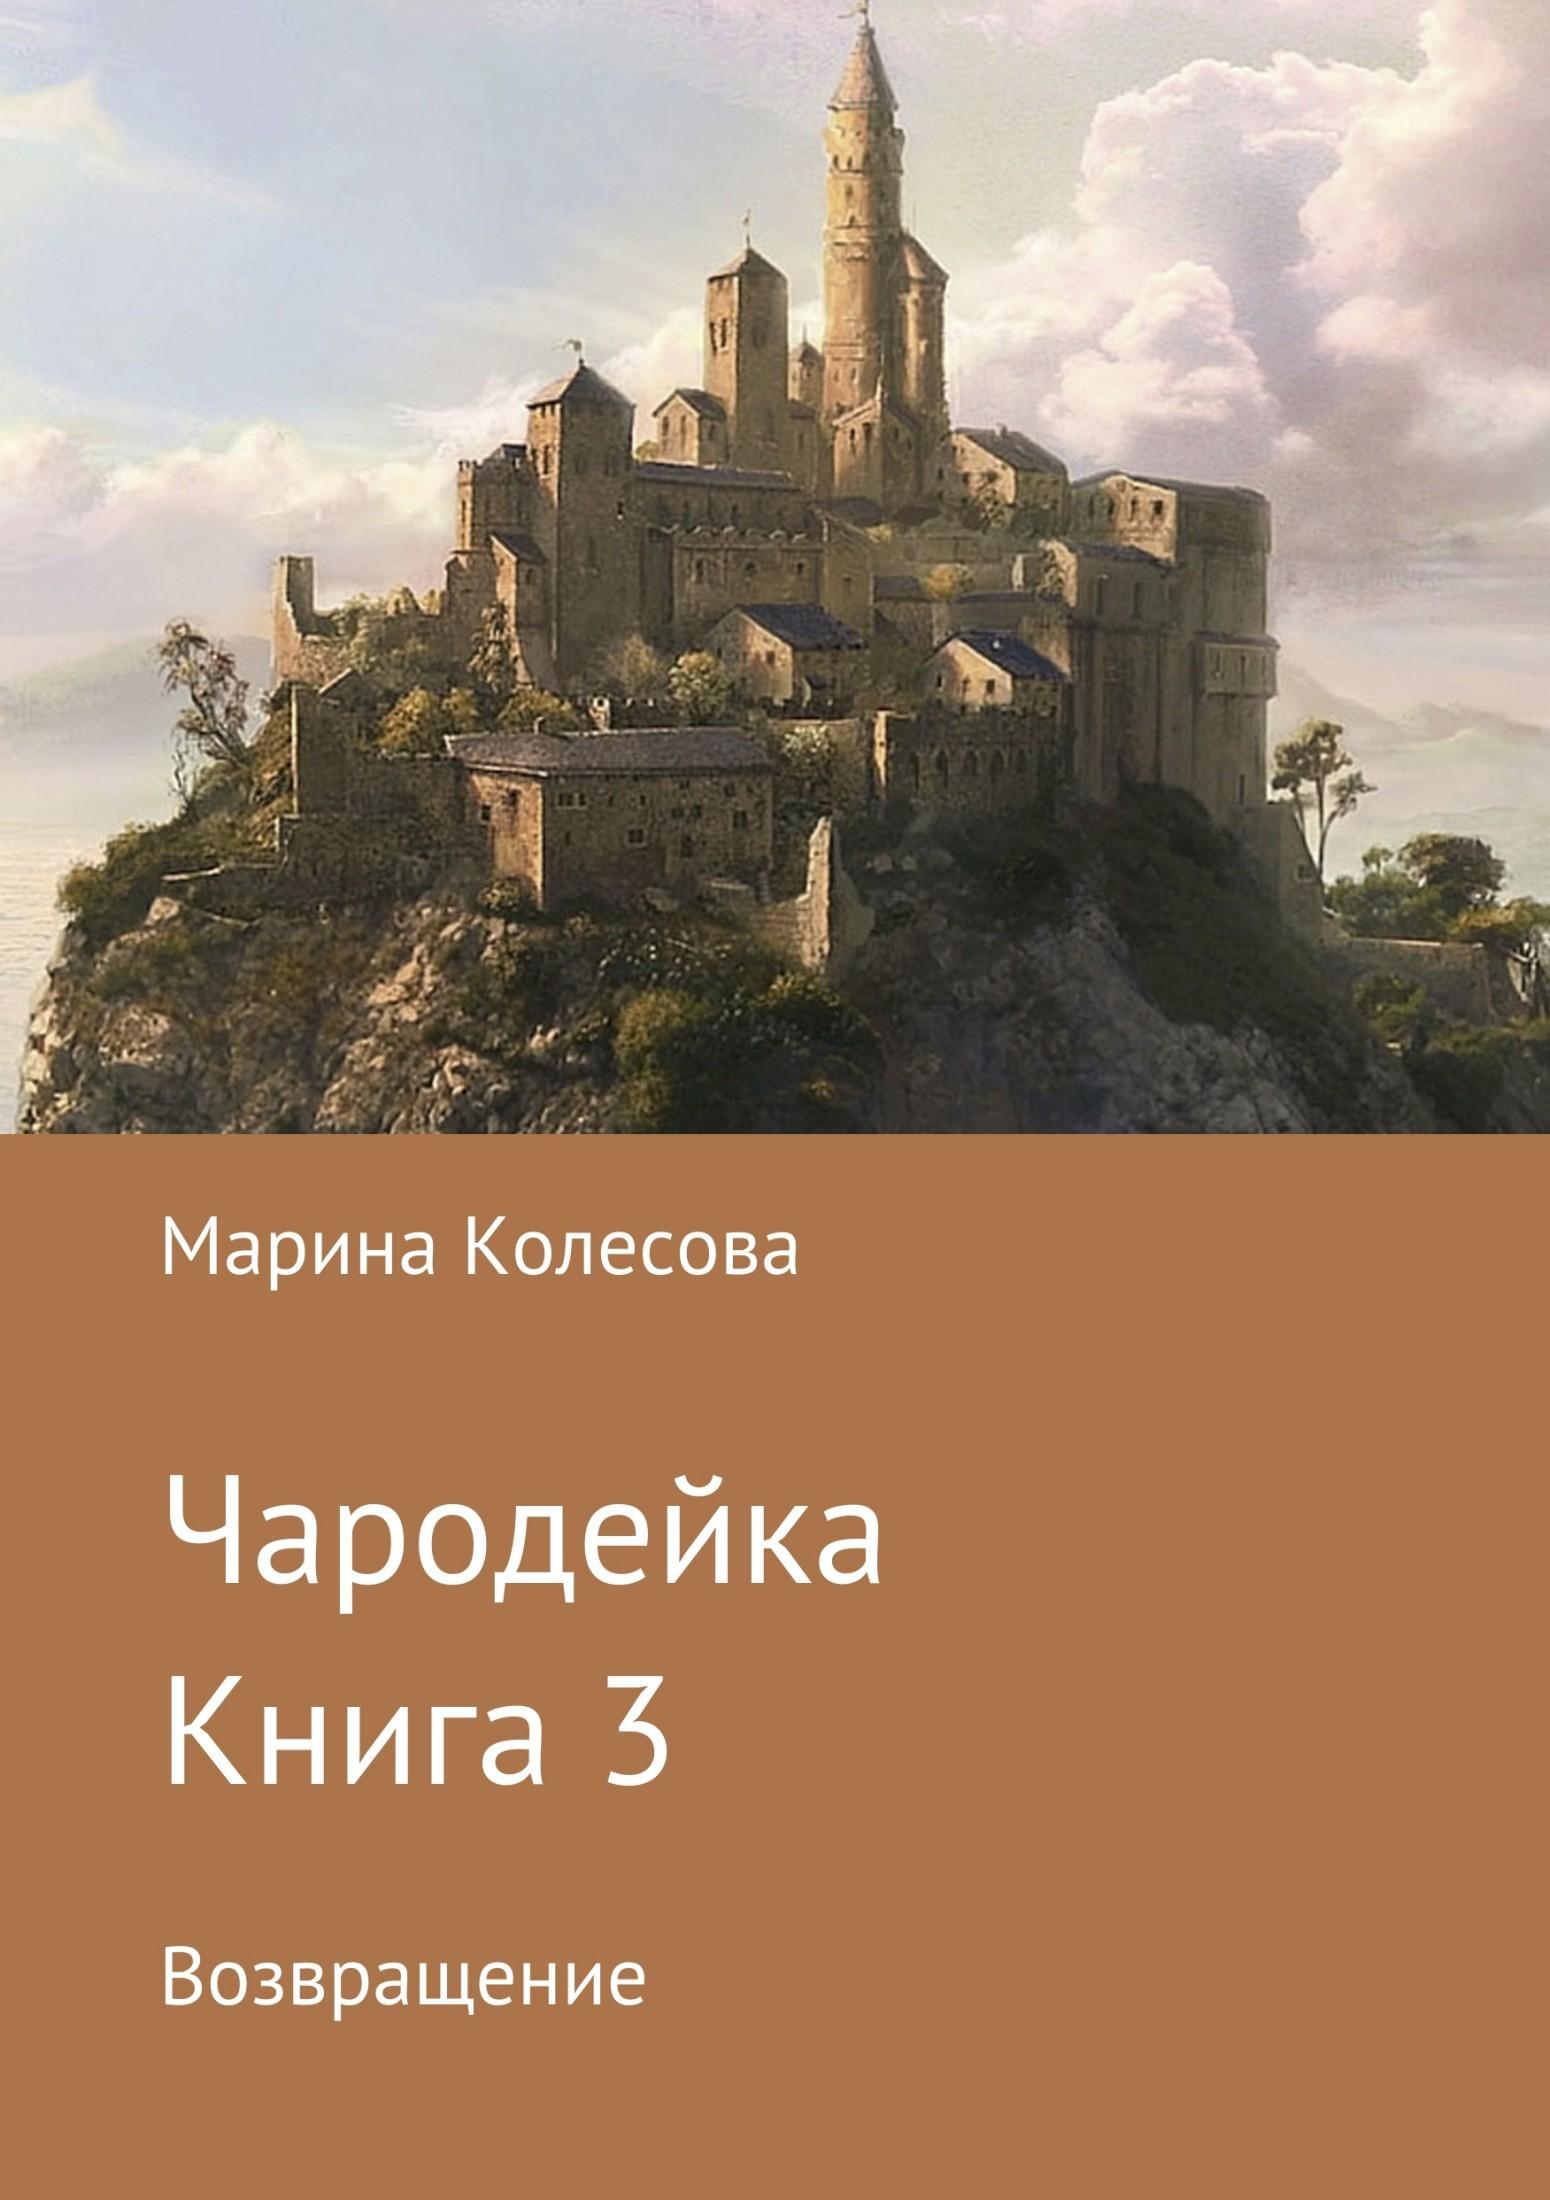 Шикарная заставка для романа 34/58/84/34588478.bin.dir/34588478.cover.jpg обложка